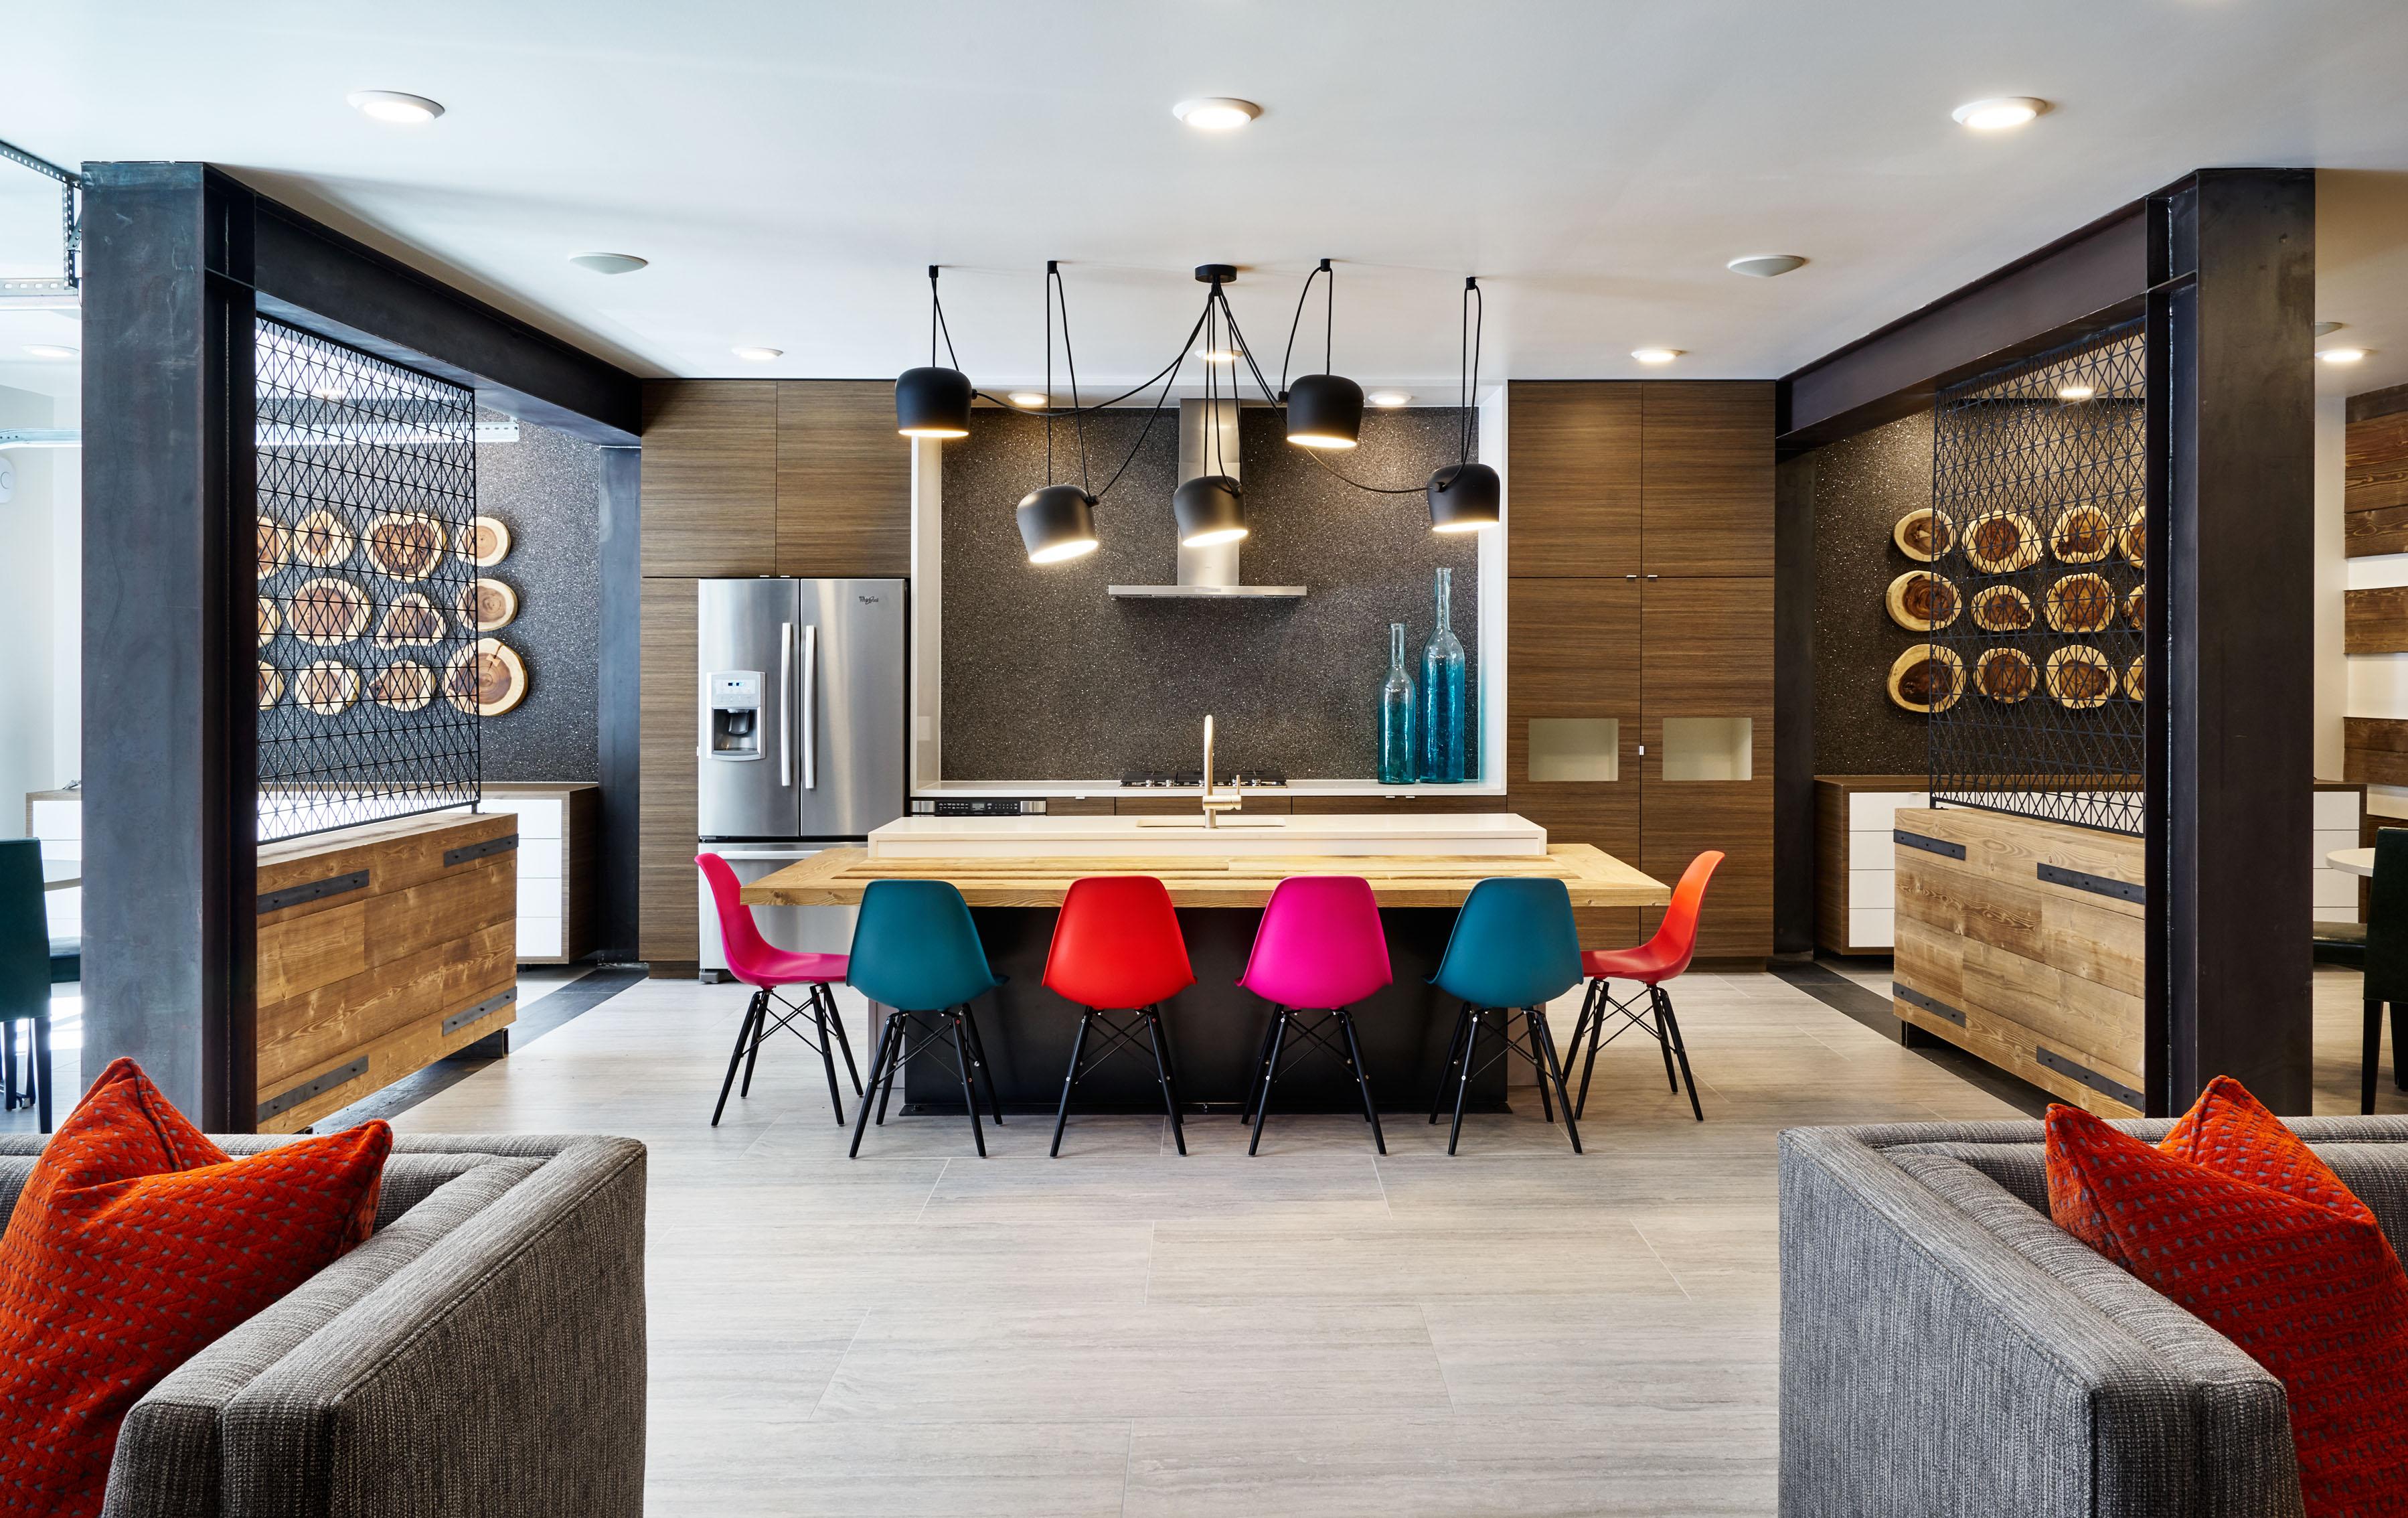 Portland Interior Design Firm Uses Creative Color